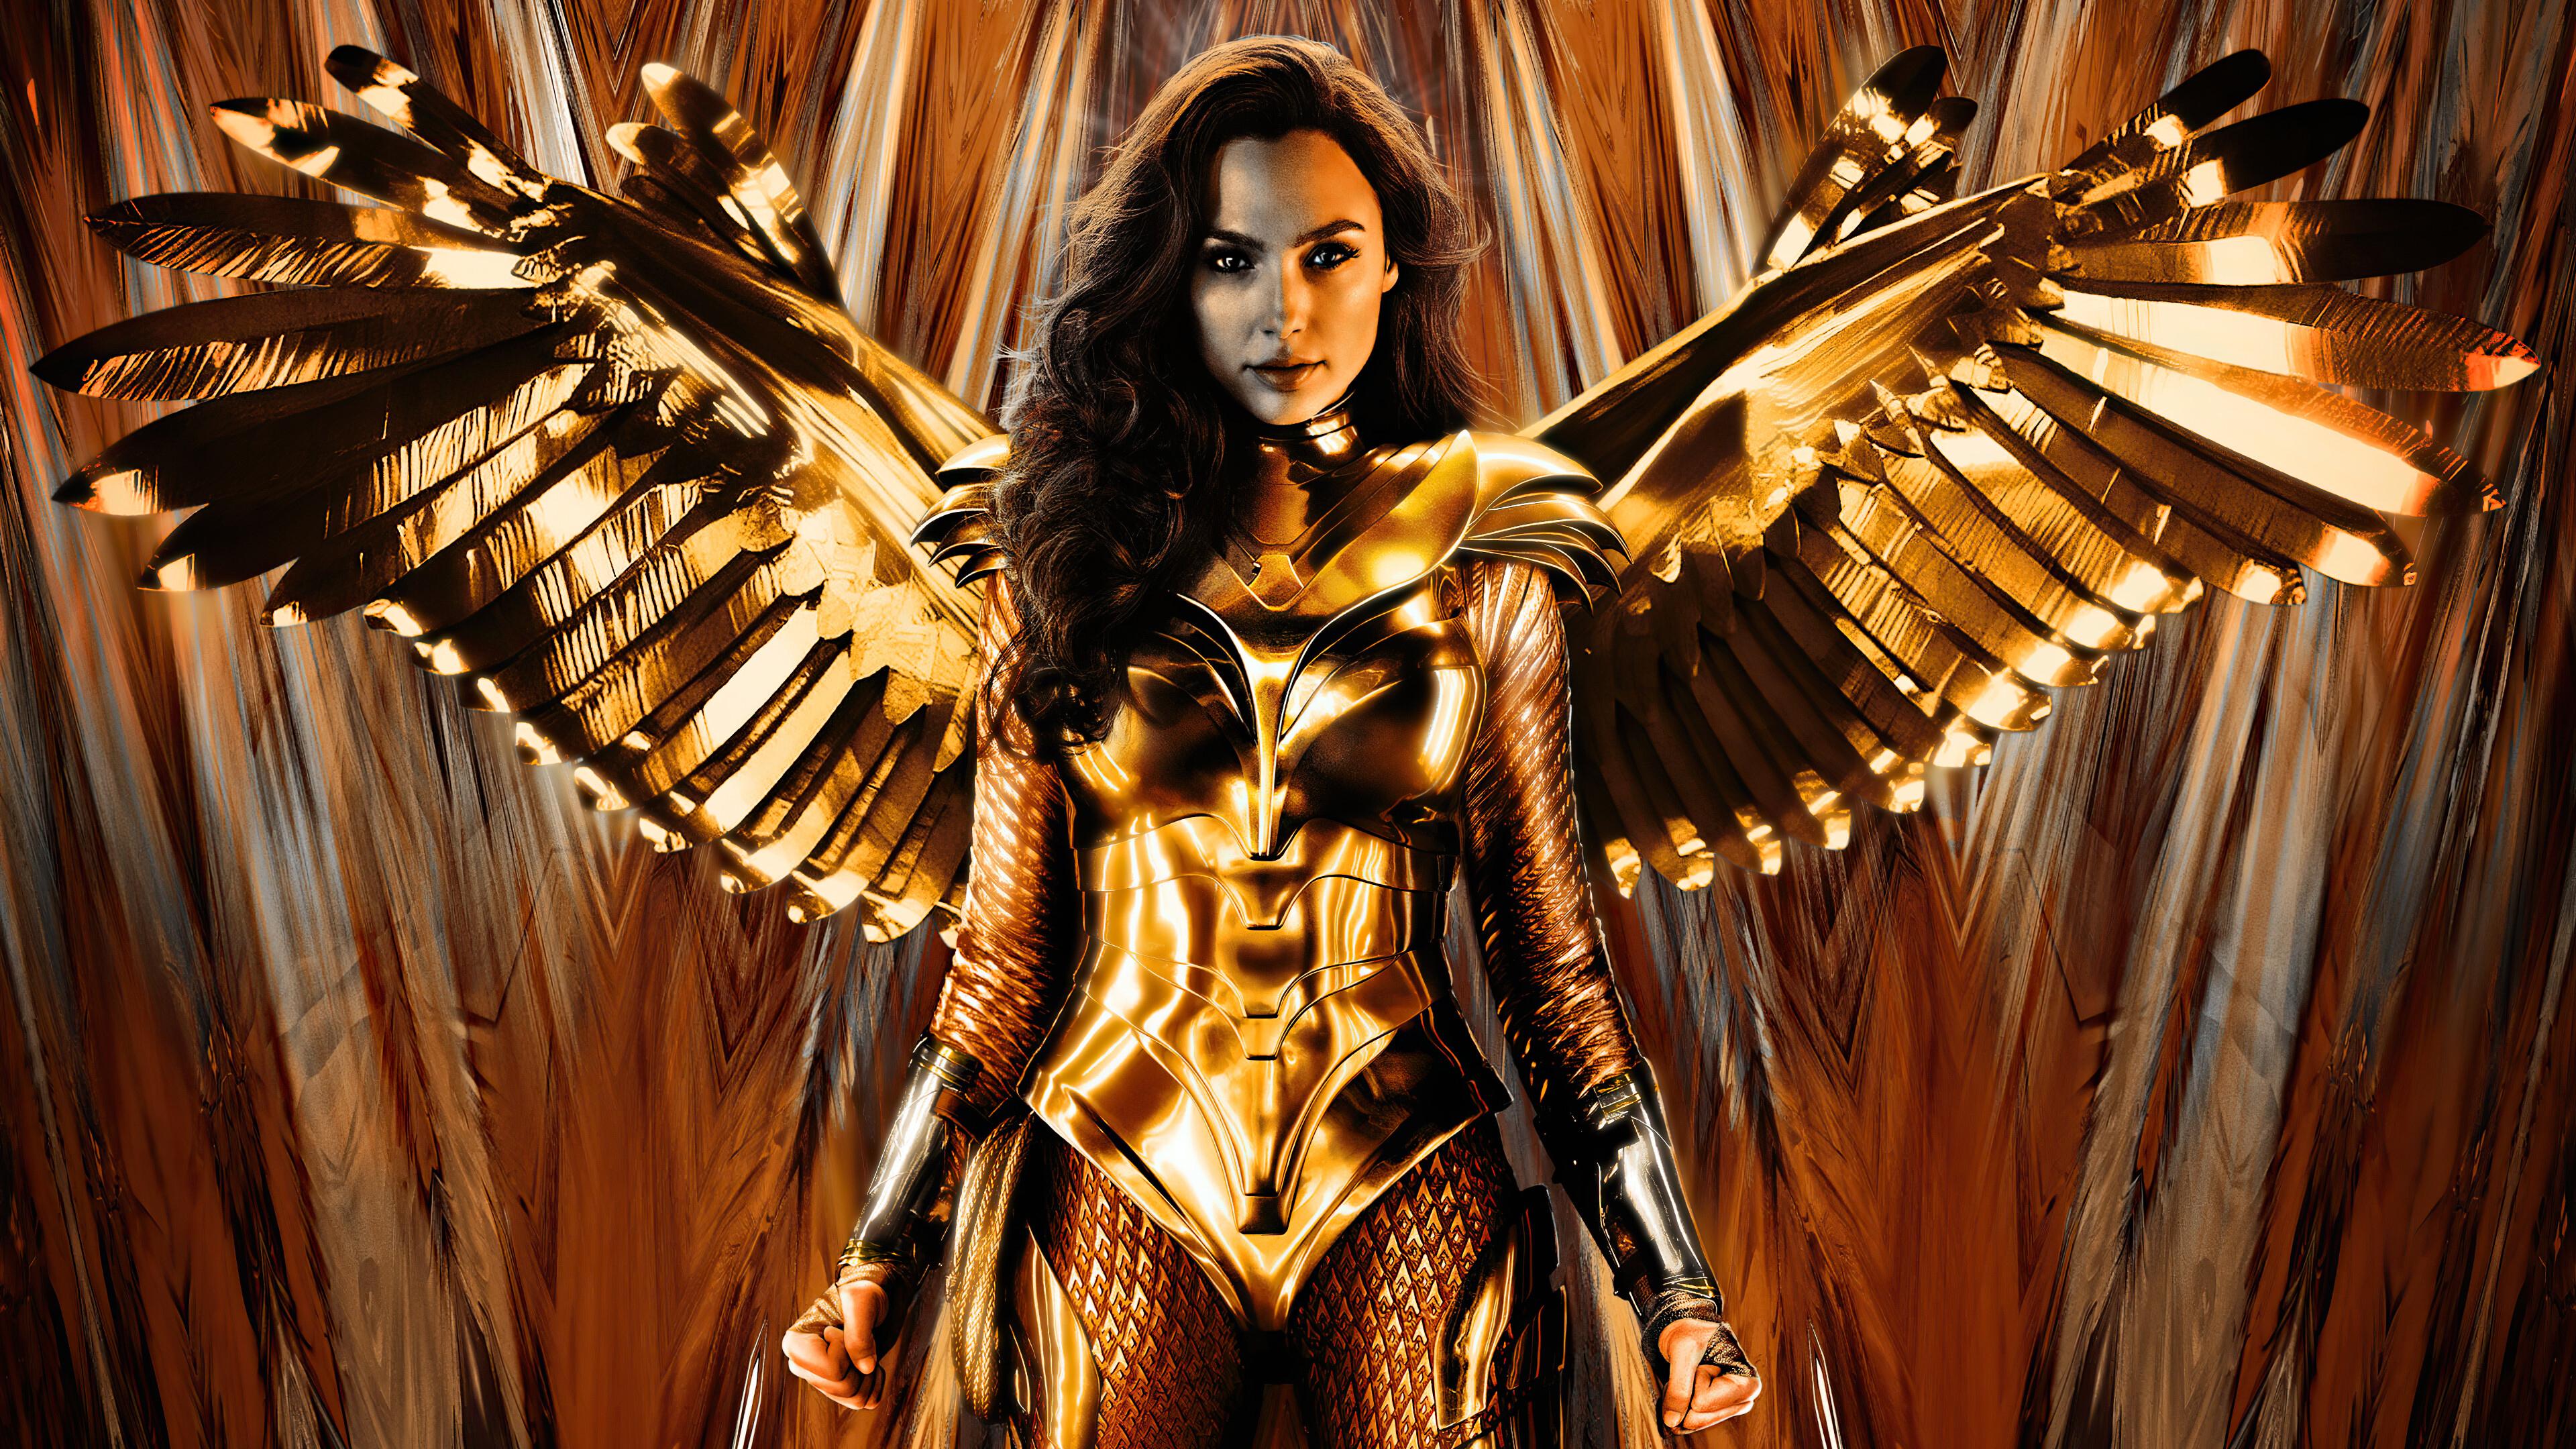 wonder woman 1984 2020 1589579306 - Wonder Woman 1984 2020 - Wonder Woman 1984 2020 wallpapers, Wonder Woman 1984 2020 4k wallpapers